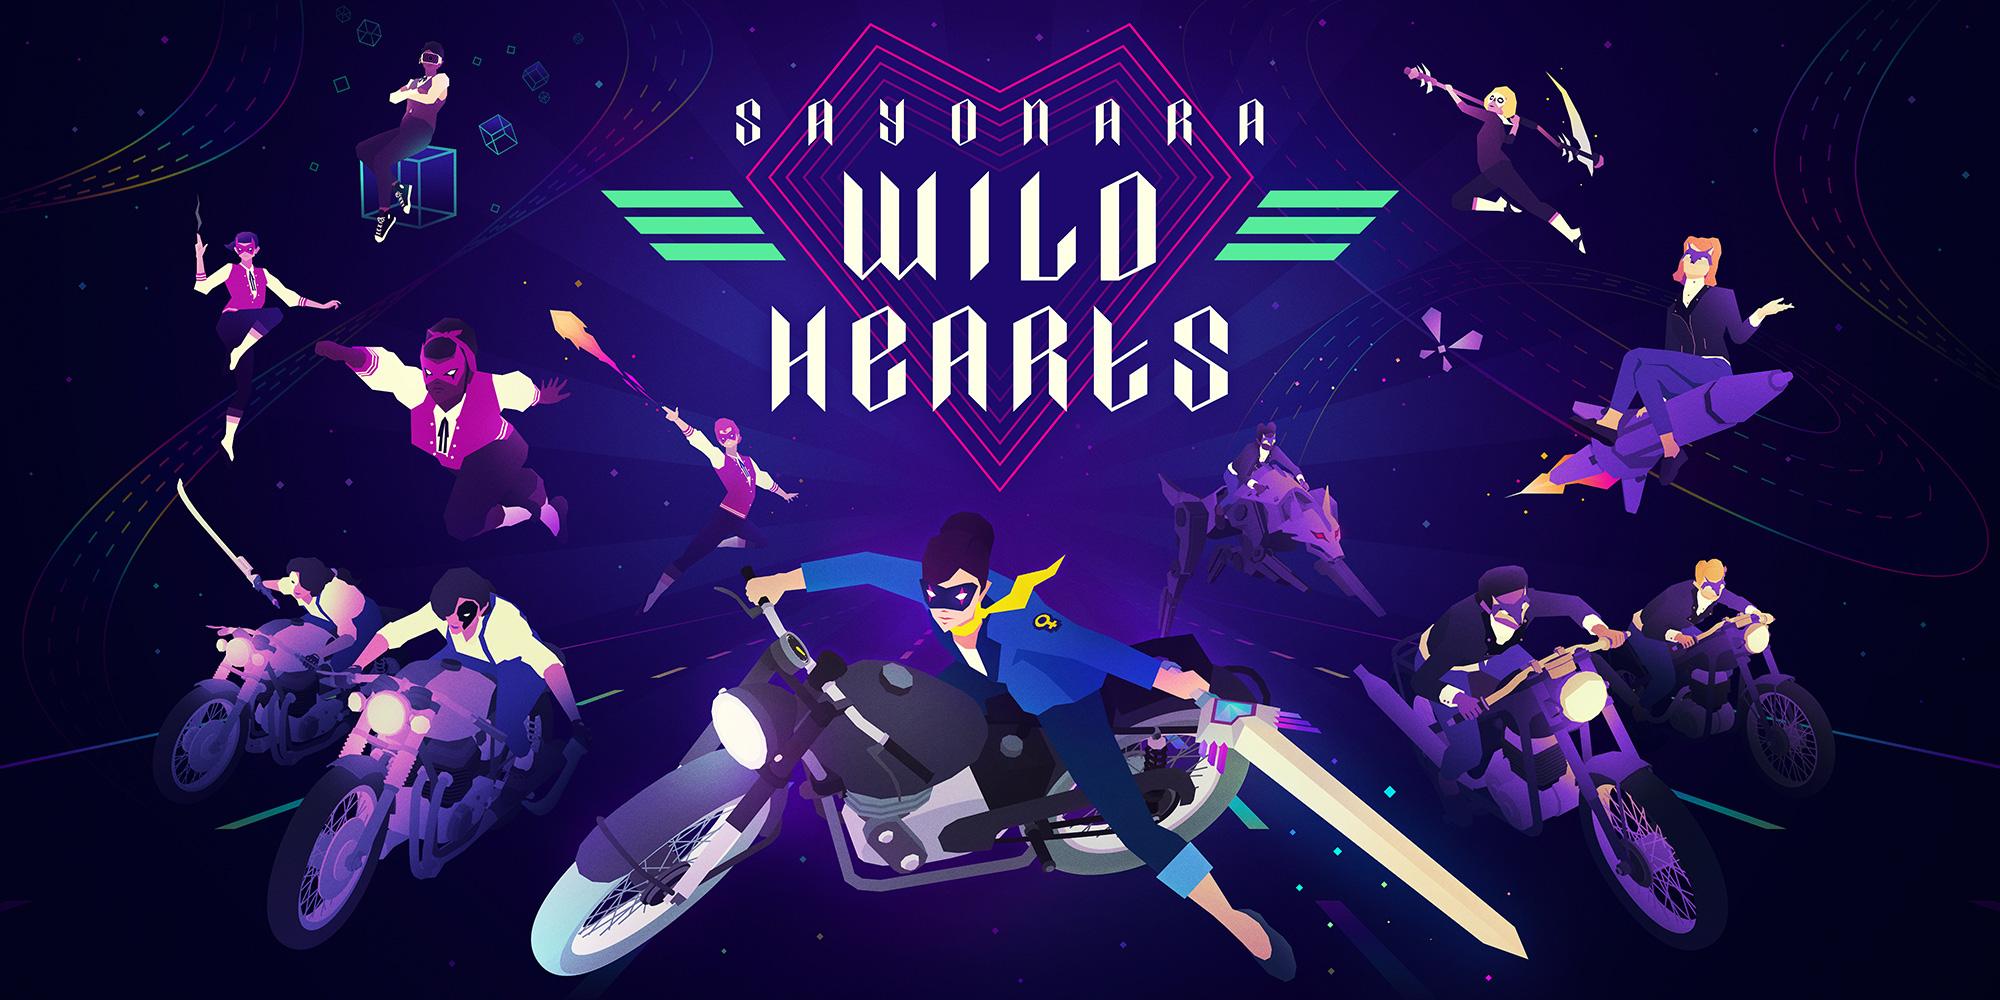 Sayonara Wild Hearts   Nintendo Switch Download-Software   Spiele   Nintendo